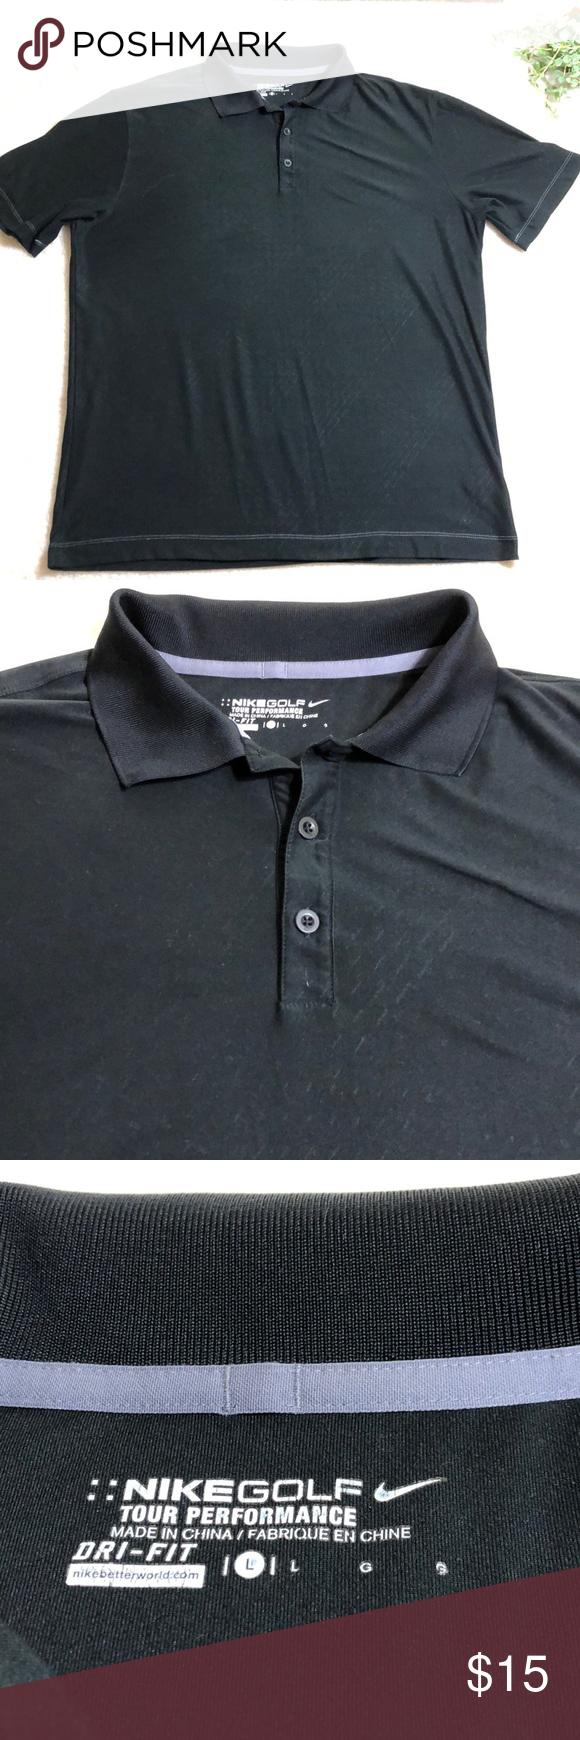 Nike Golf Mens Drifit Tour Performance Polo Shirt Performance Polos Shirts Polo Shirt